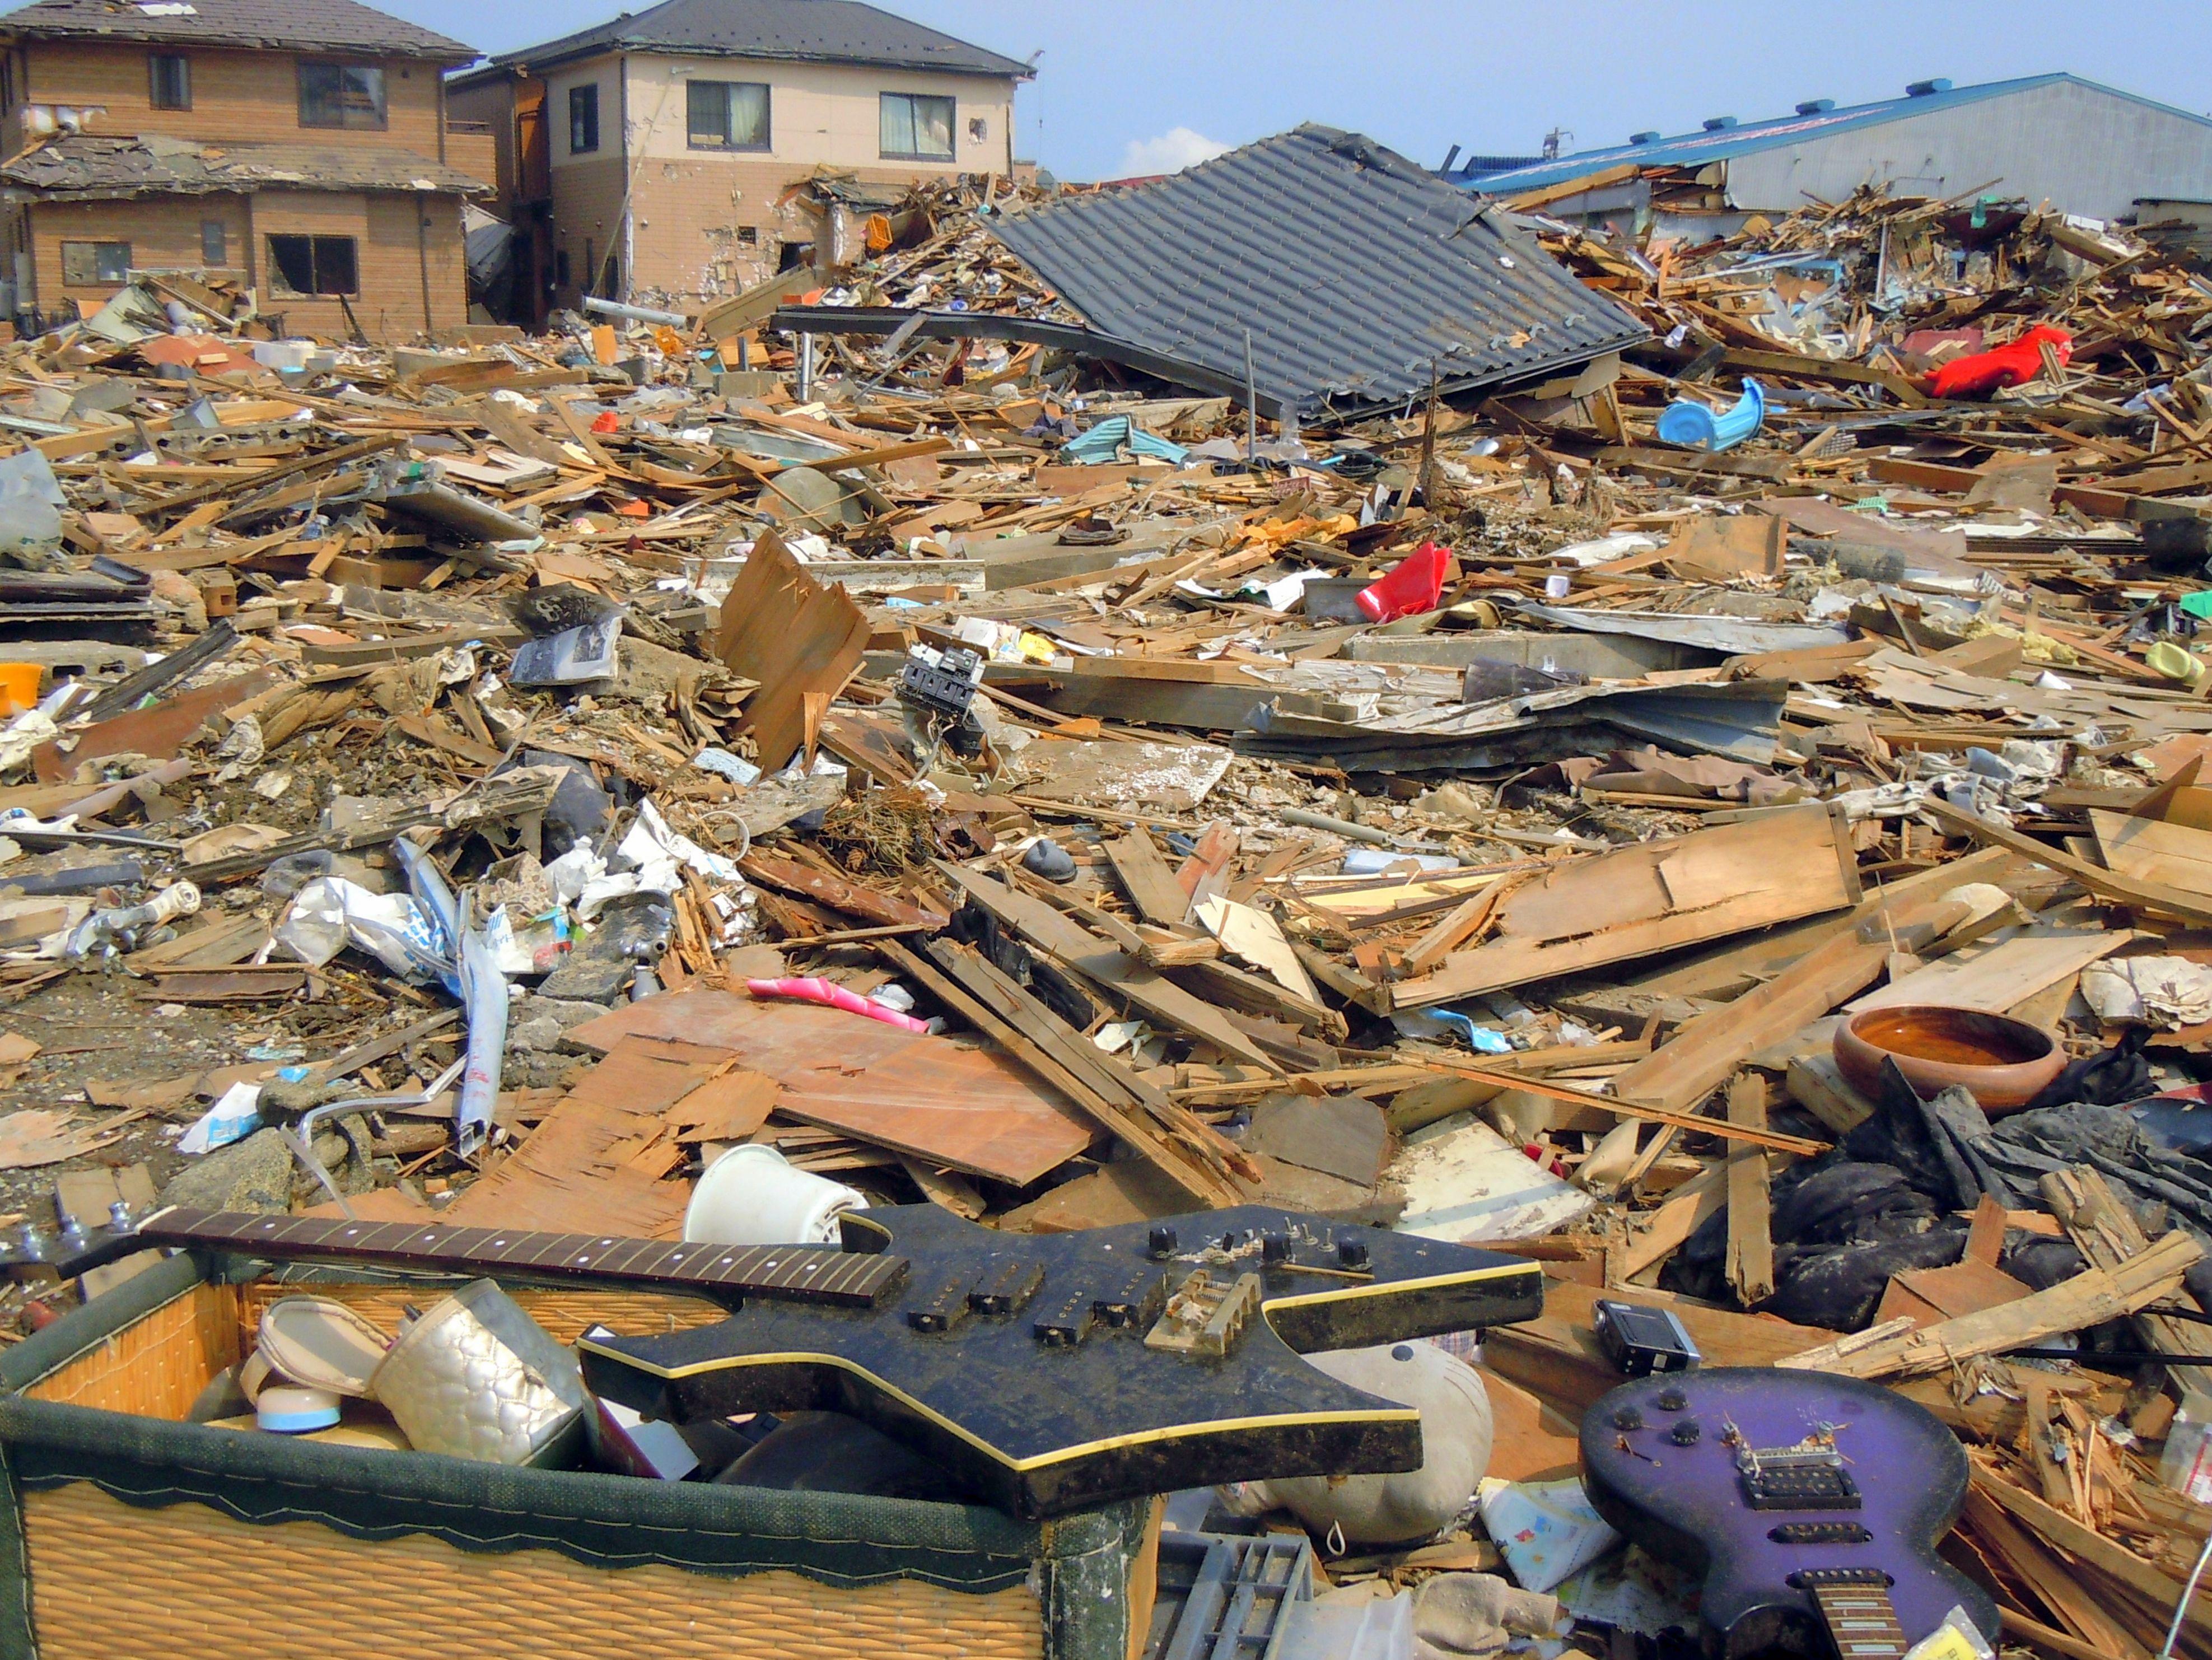 Destruction aftermath of Japan 2011 Tohoku